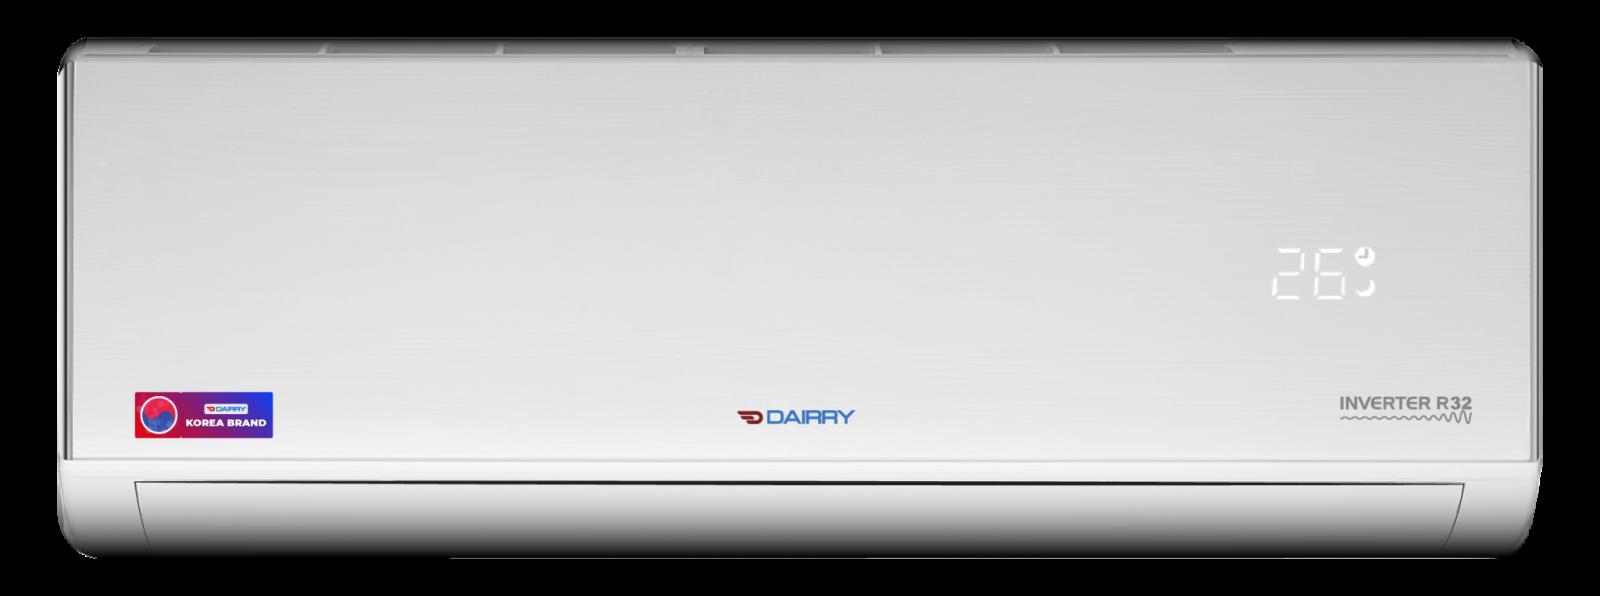 Điều hòa Dairry I-DR24KH 24000btu 2 chiều inverter